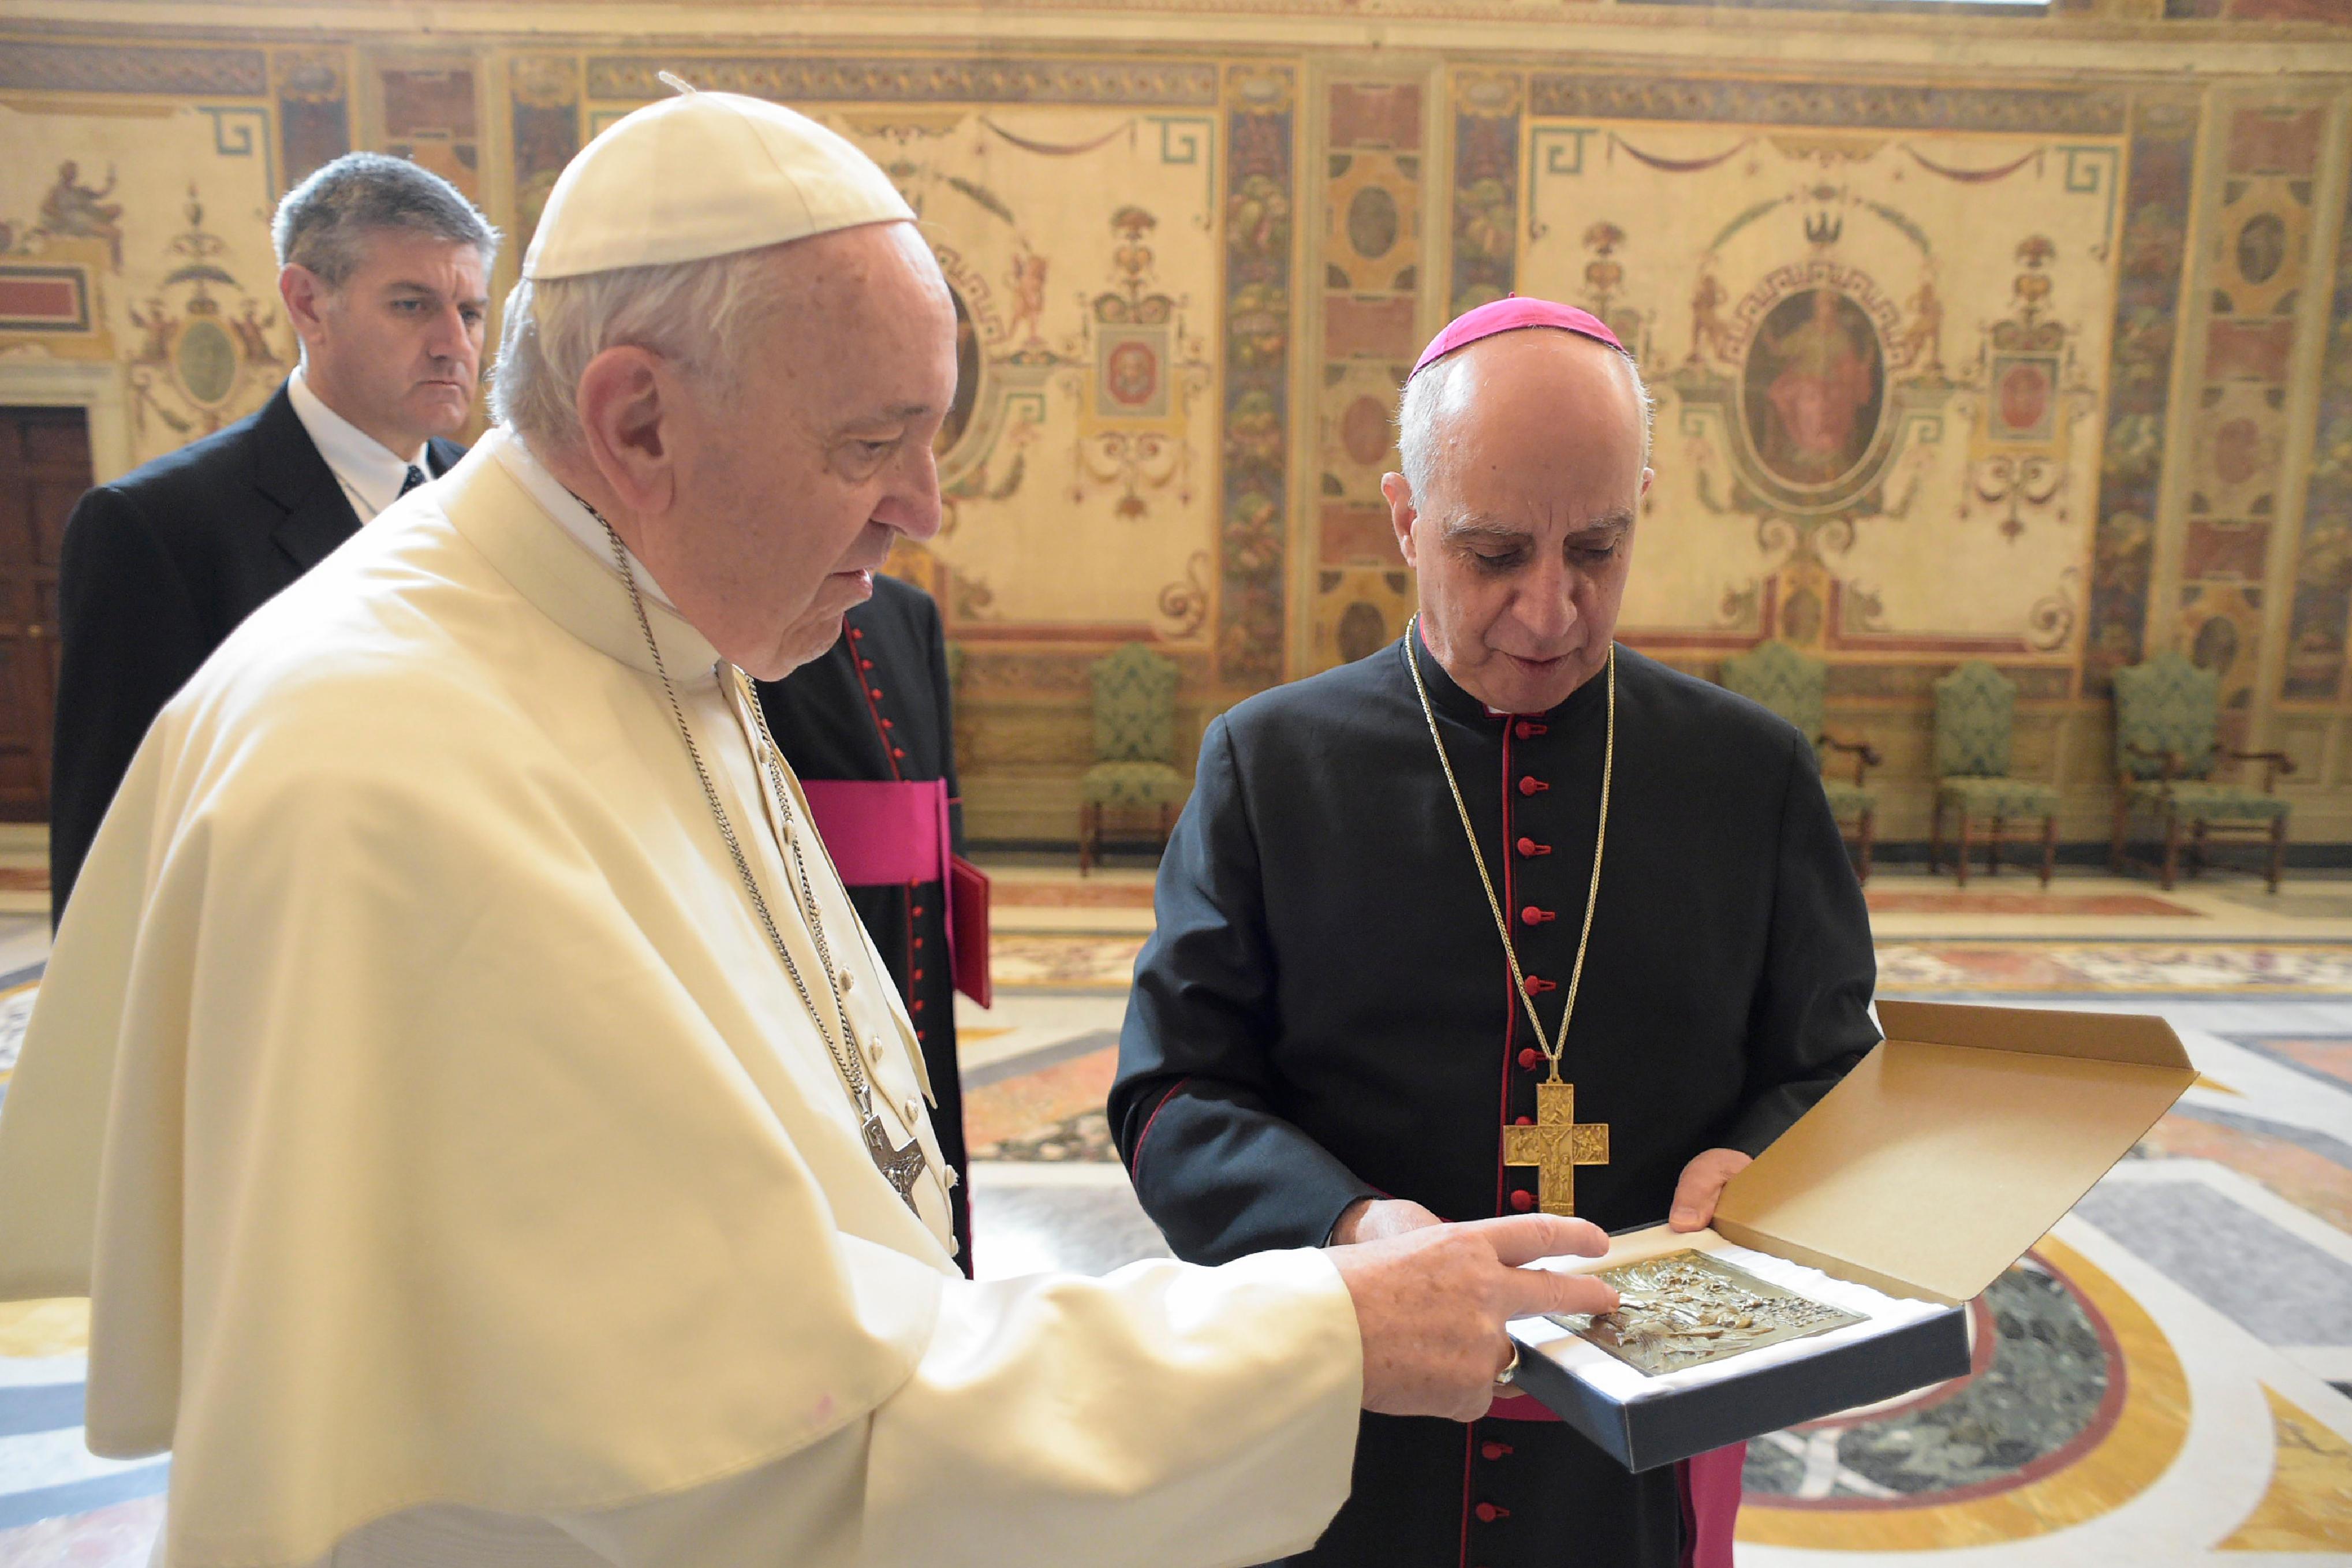 Mgr R. Fisichella Missionnaires de la miséricorde 10/04/2018 © Vatican Media